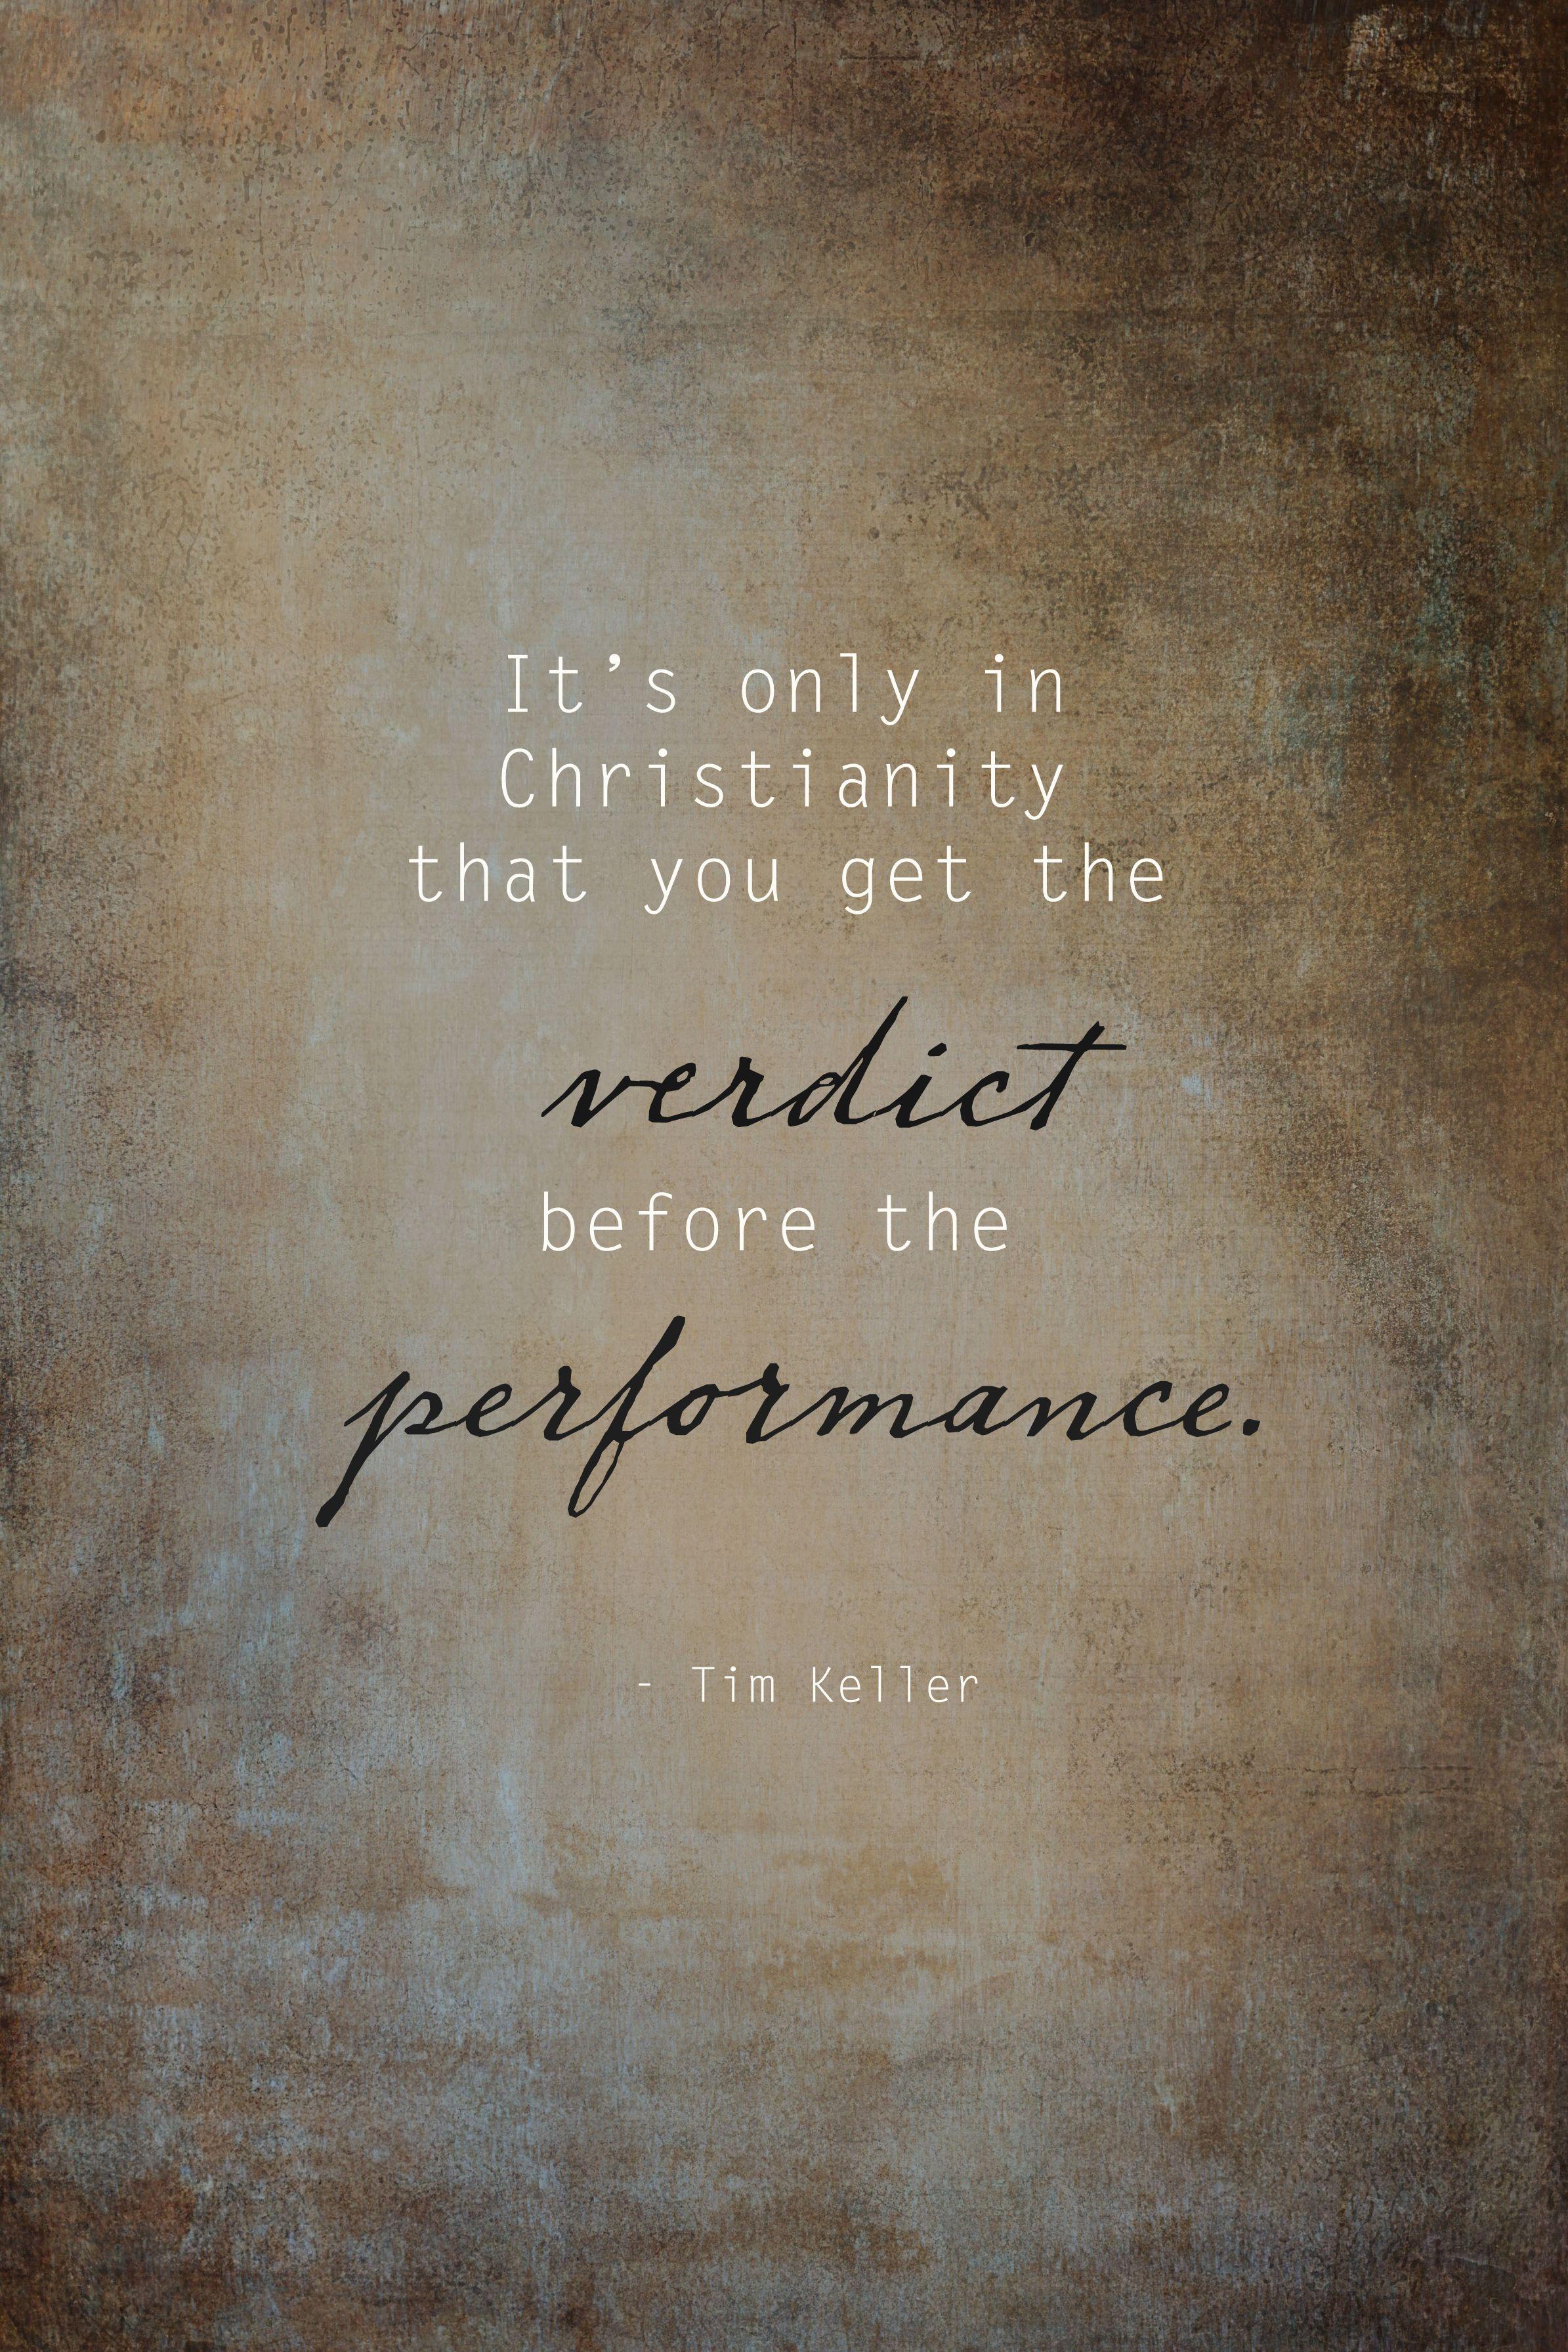 Timothy Keller Quotes Entrancing Quotetim Keller Texturejessica Drossin  Quotes